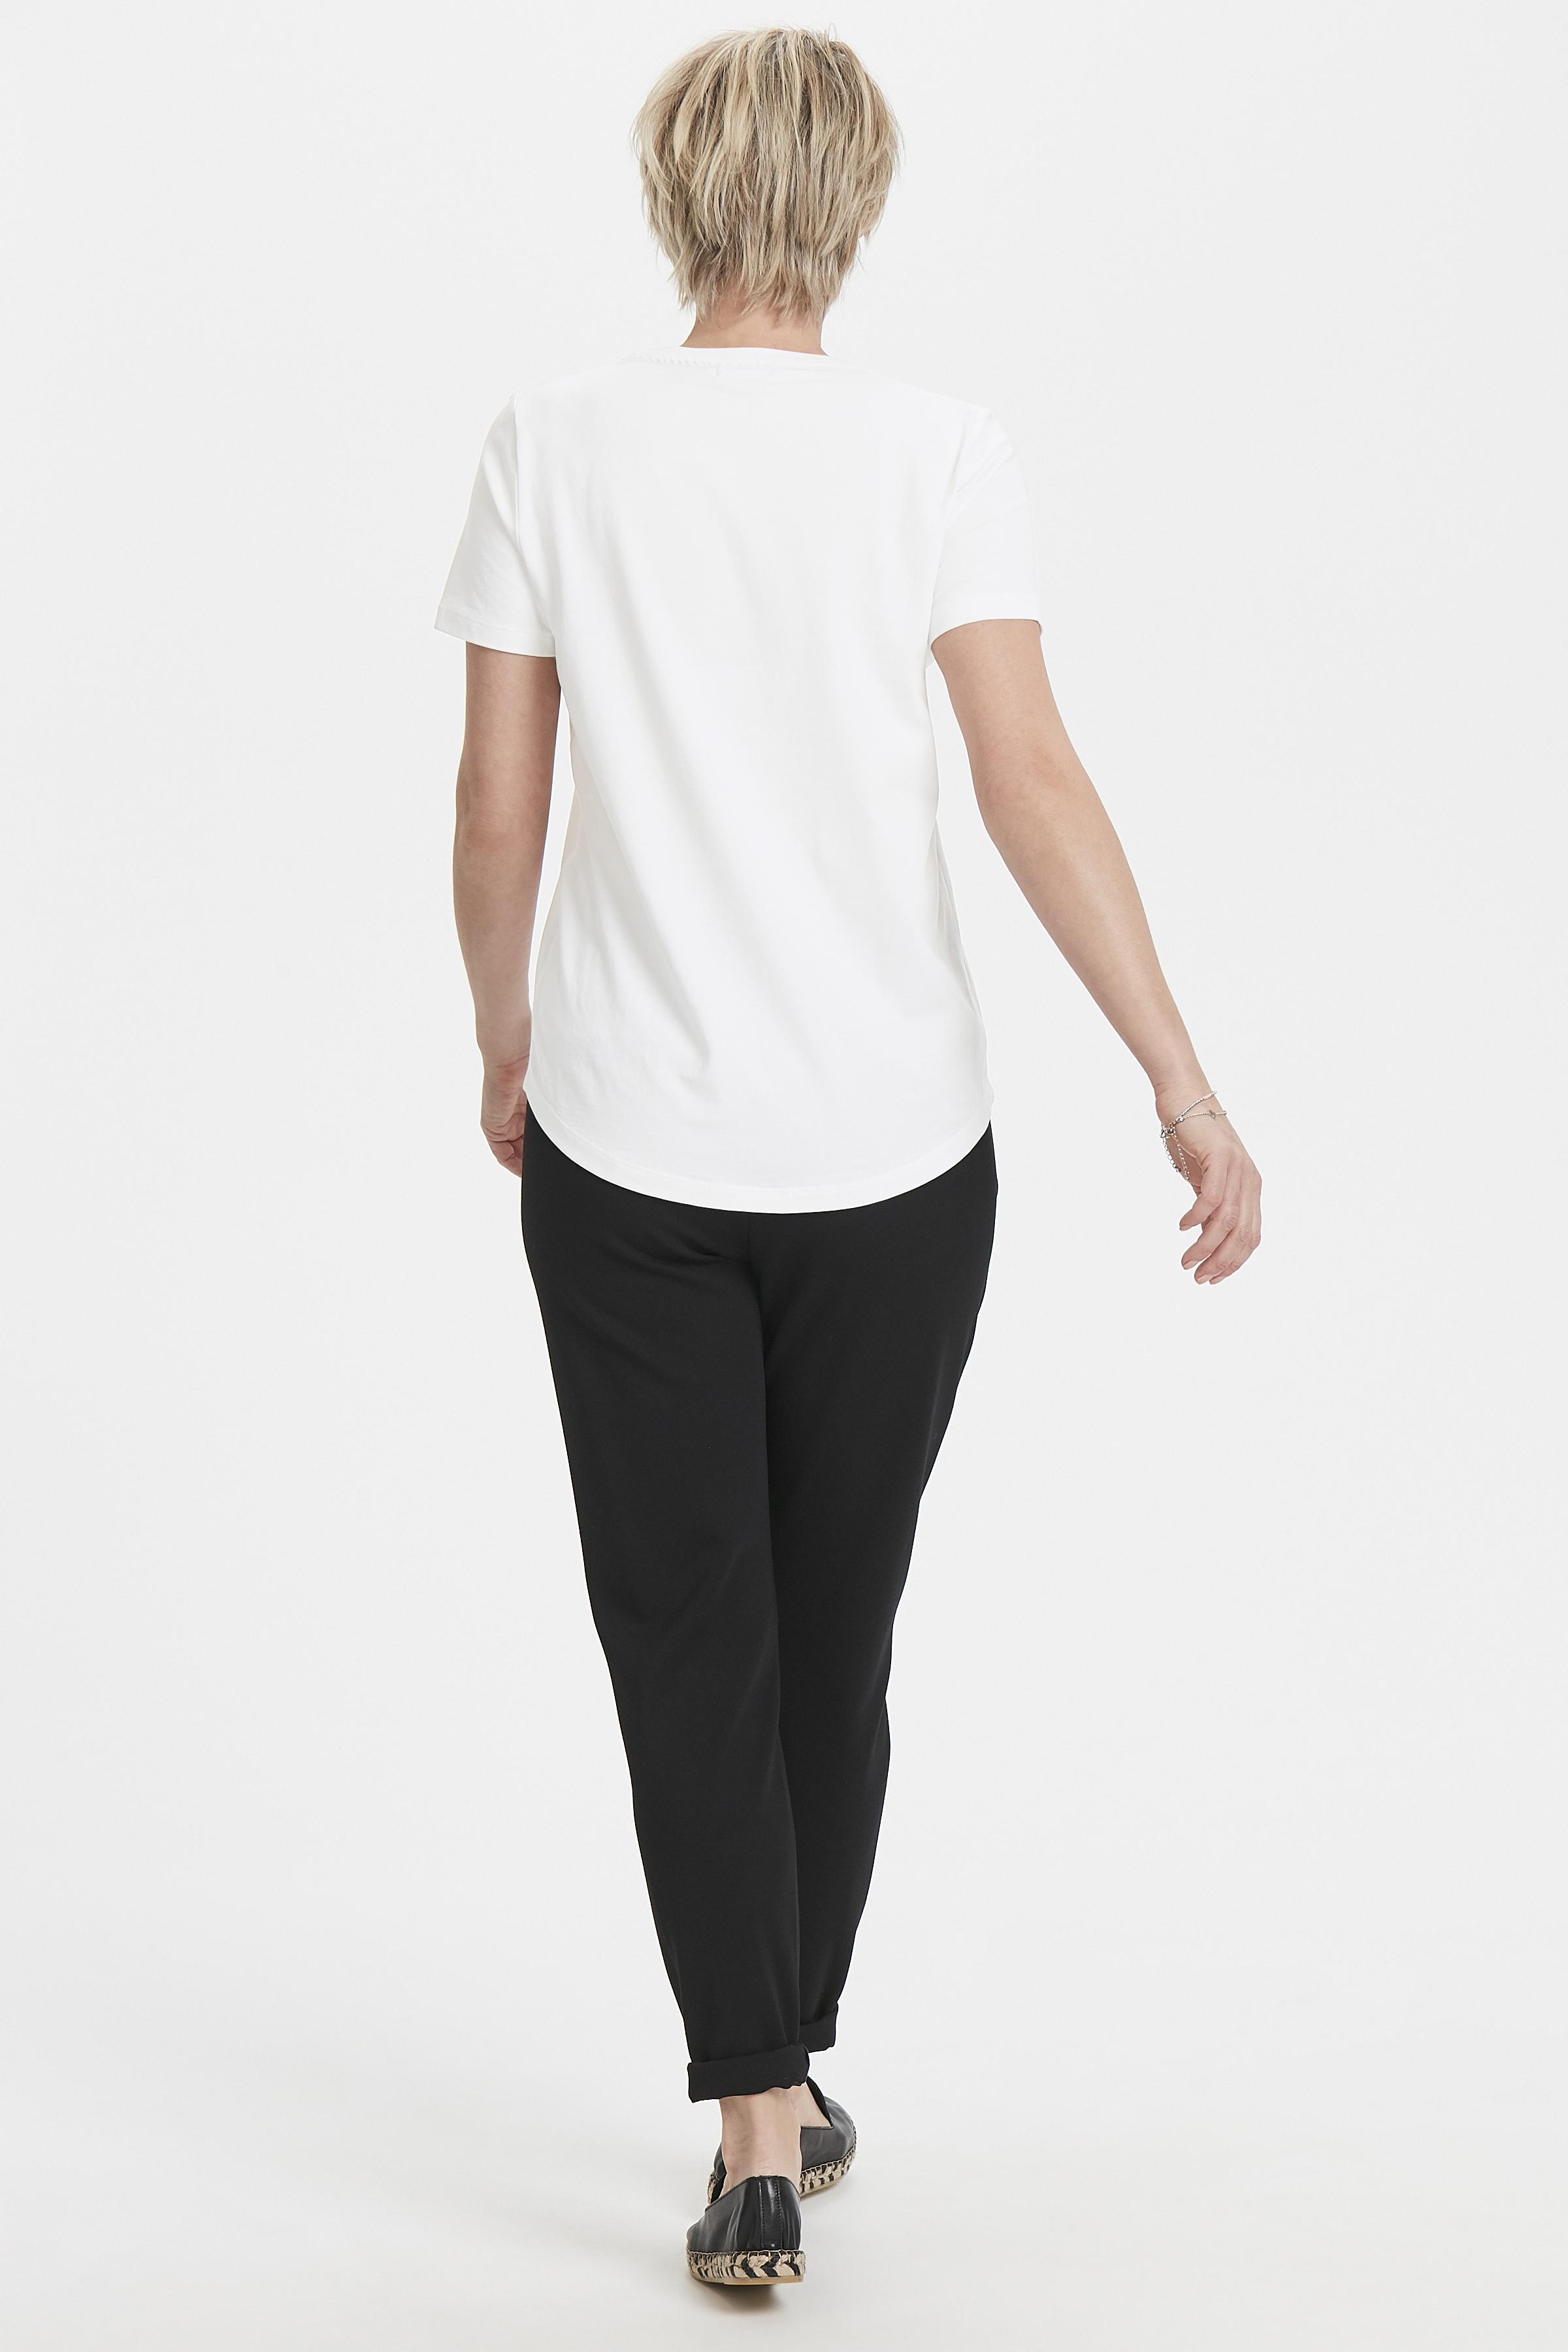 Wollweiß Kurzarm-Shirt von Bon'A Parte – Shoppen Sie Wollweiß Kurzarm-Shirt ab Gr. S-2XL hier